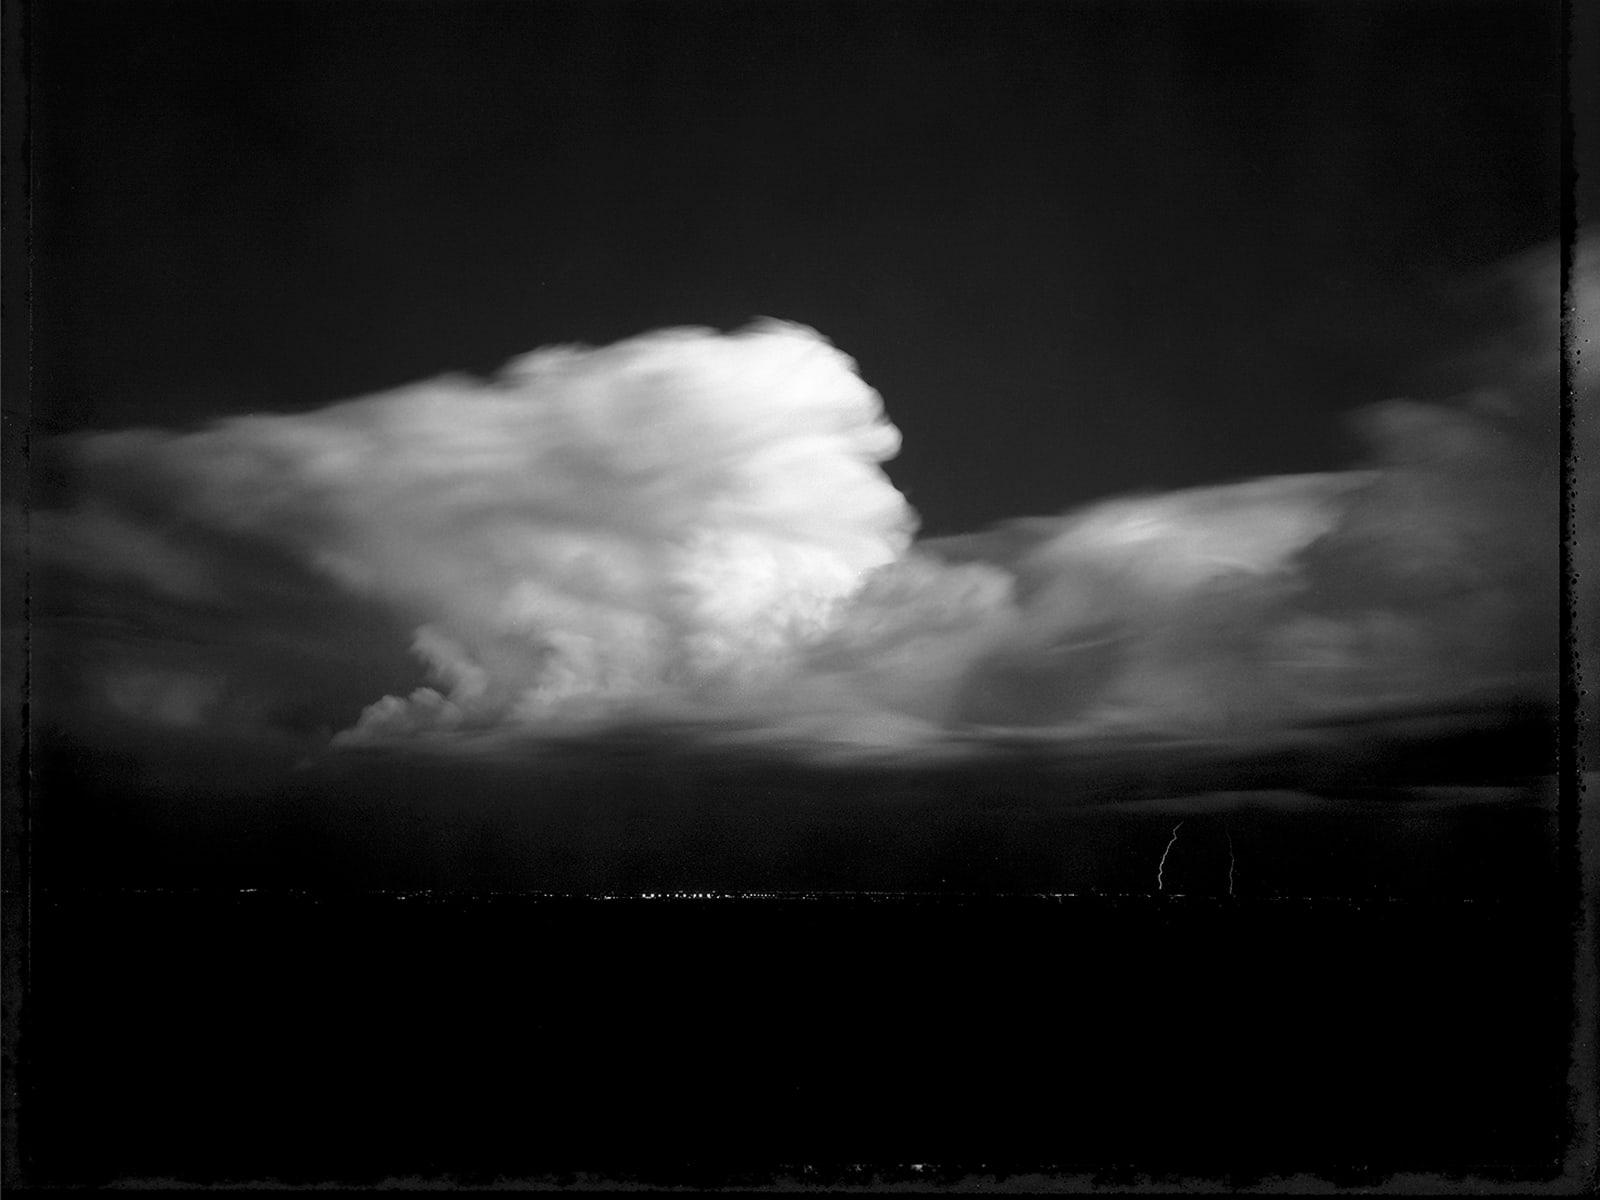 Mark Klett - Night Storm, Glendale, AZ 10/93, 1993